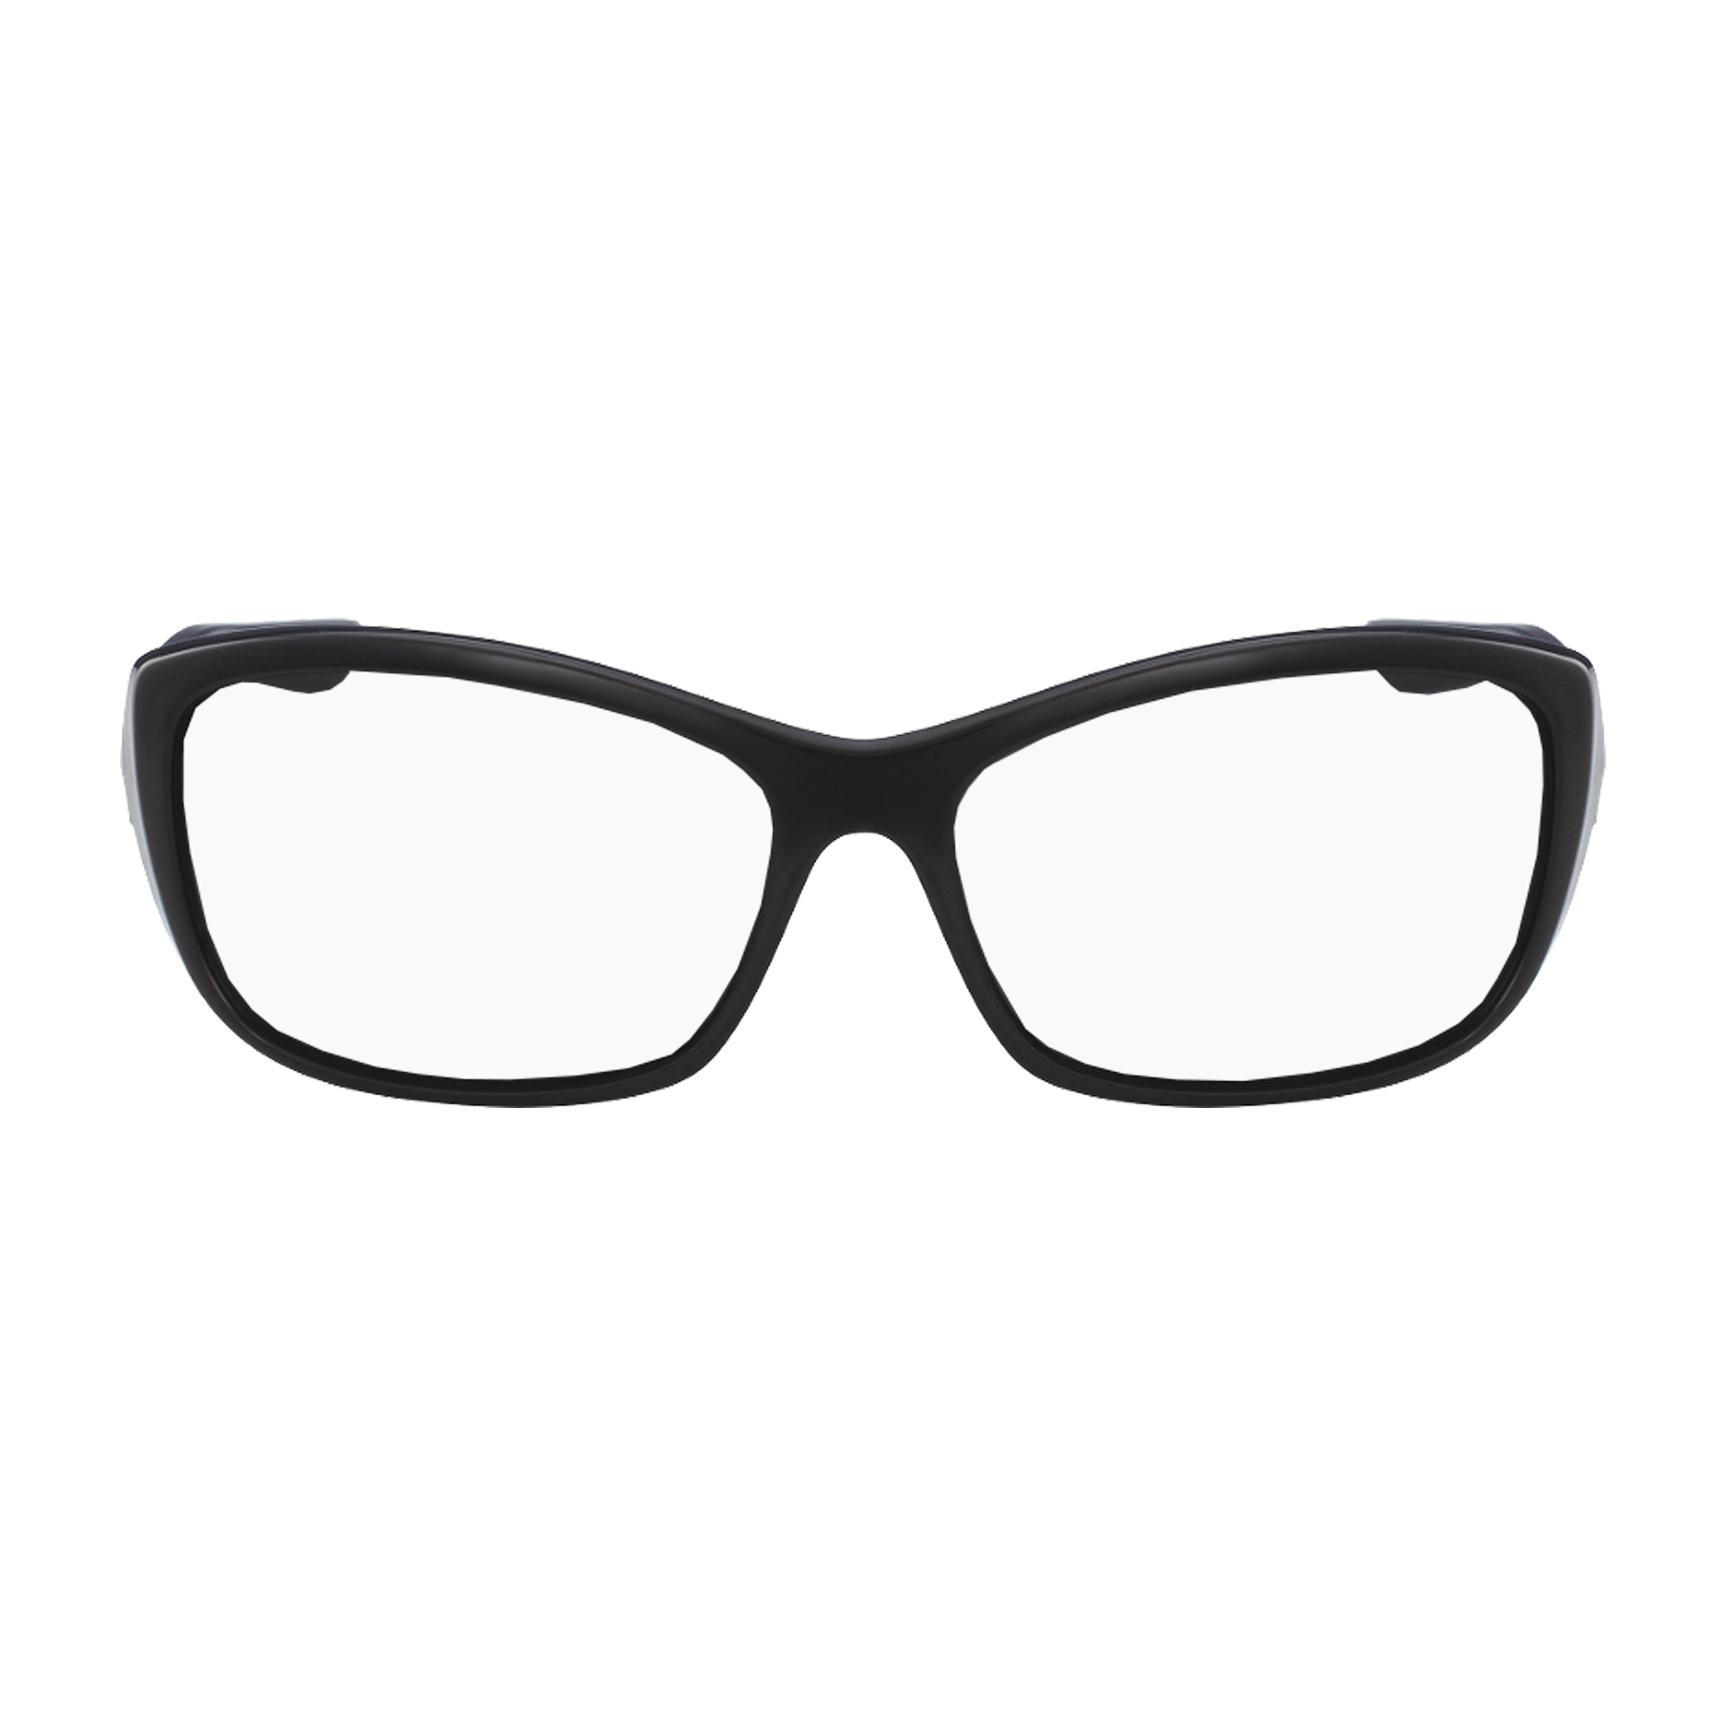 Nike Finesse Lead Glasses. $336.00. Infab Corporation